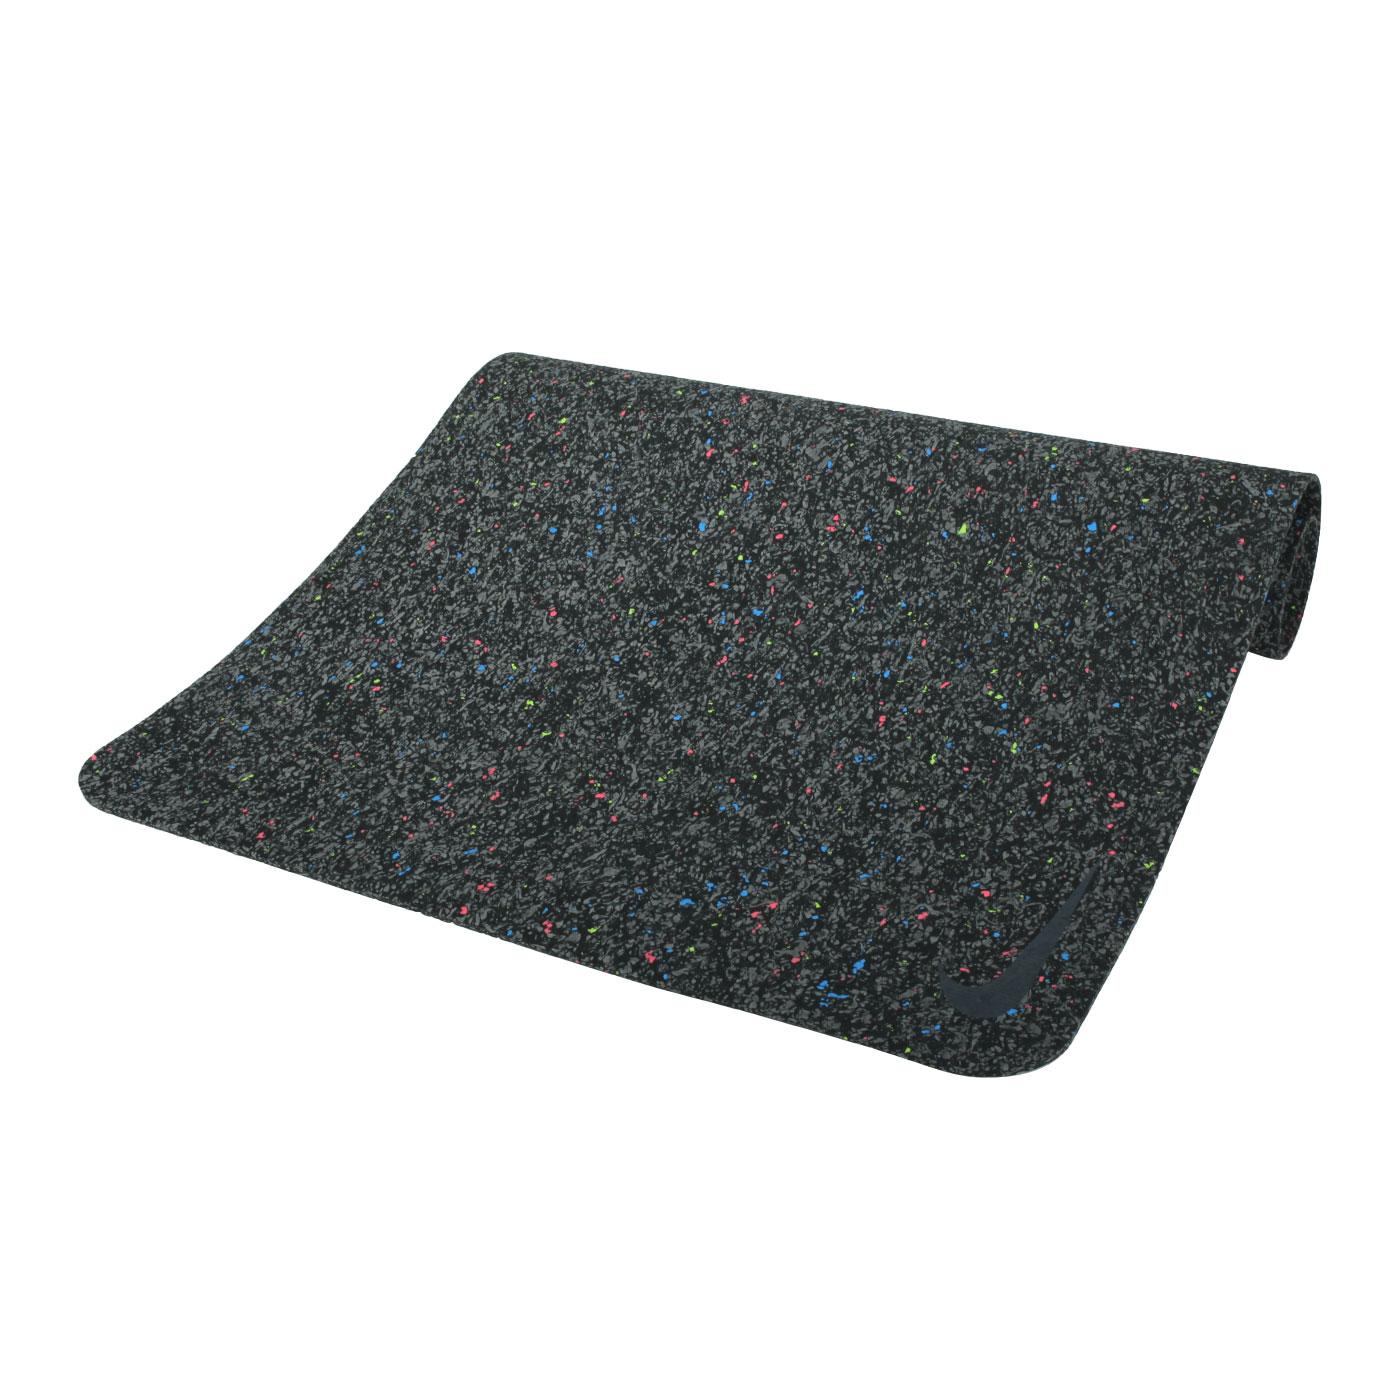 NIKE MOVE 4MM 瑜珈墊 172CM 35D N1003061997OS - 黑灰藍粉綠